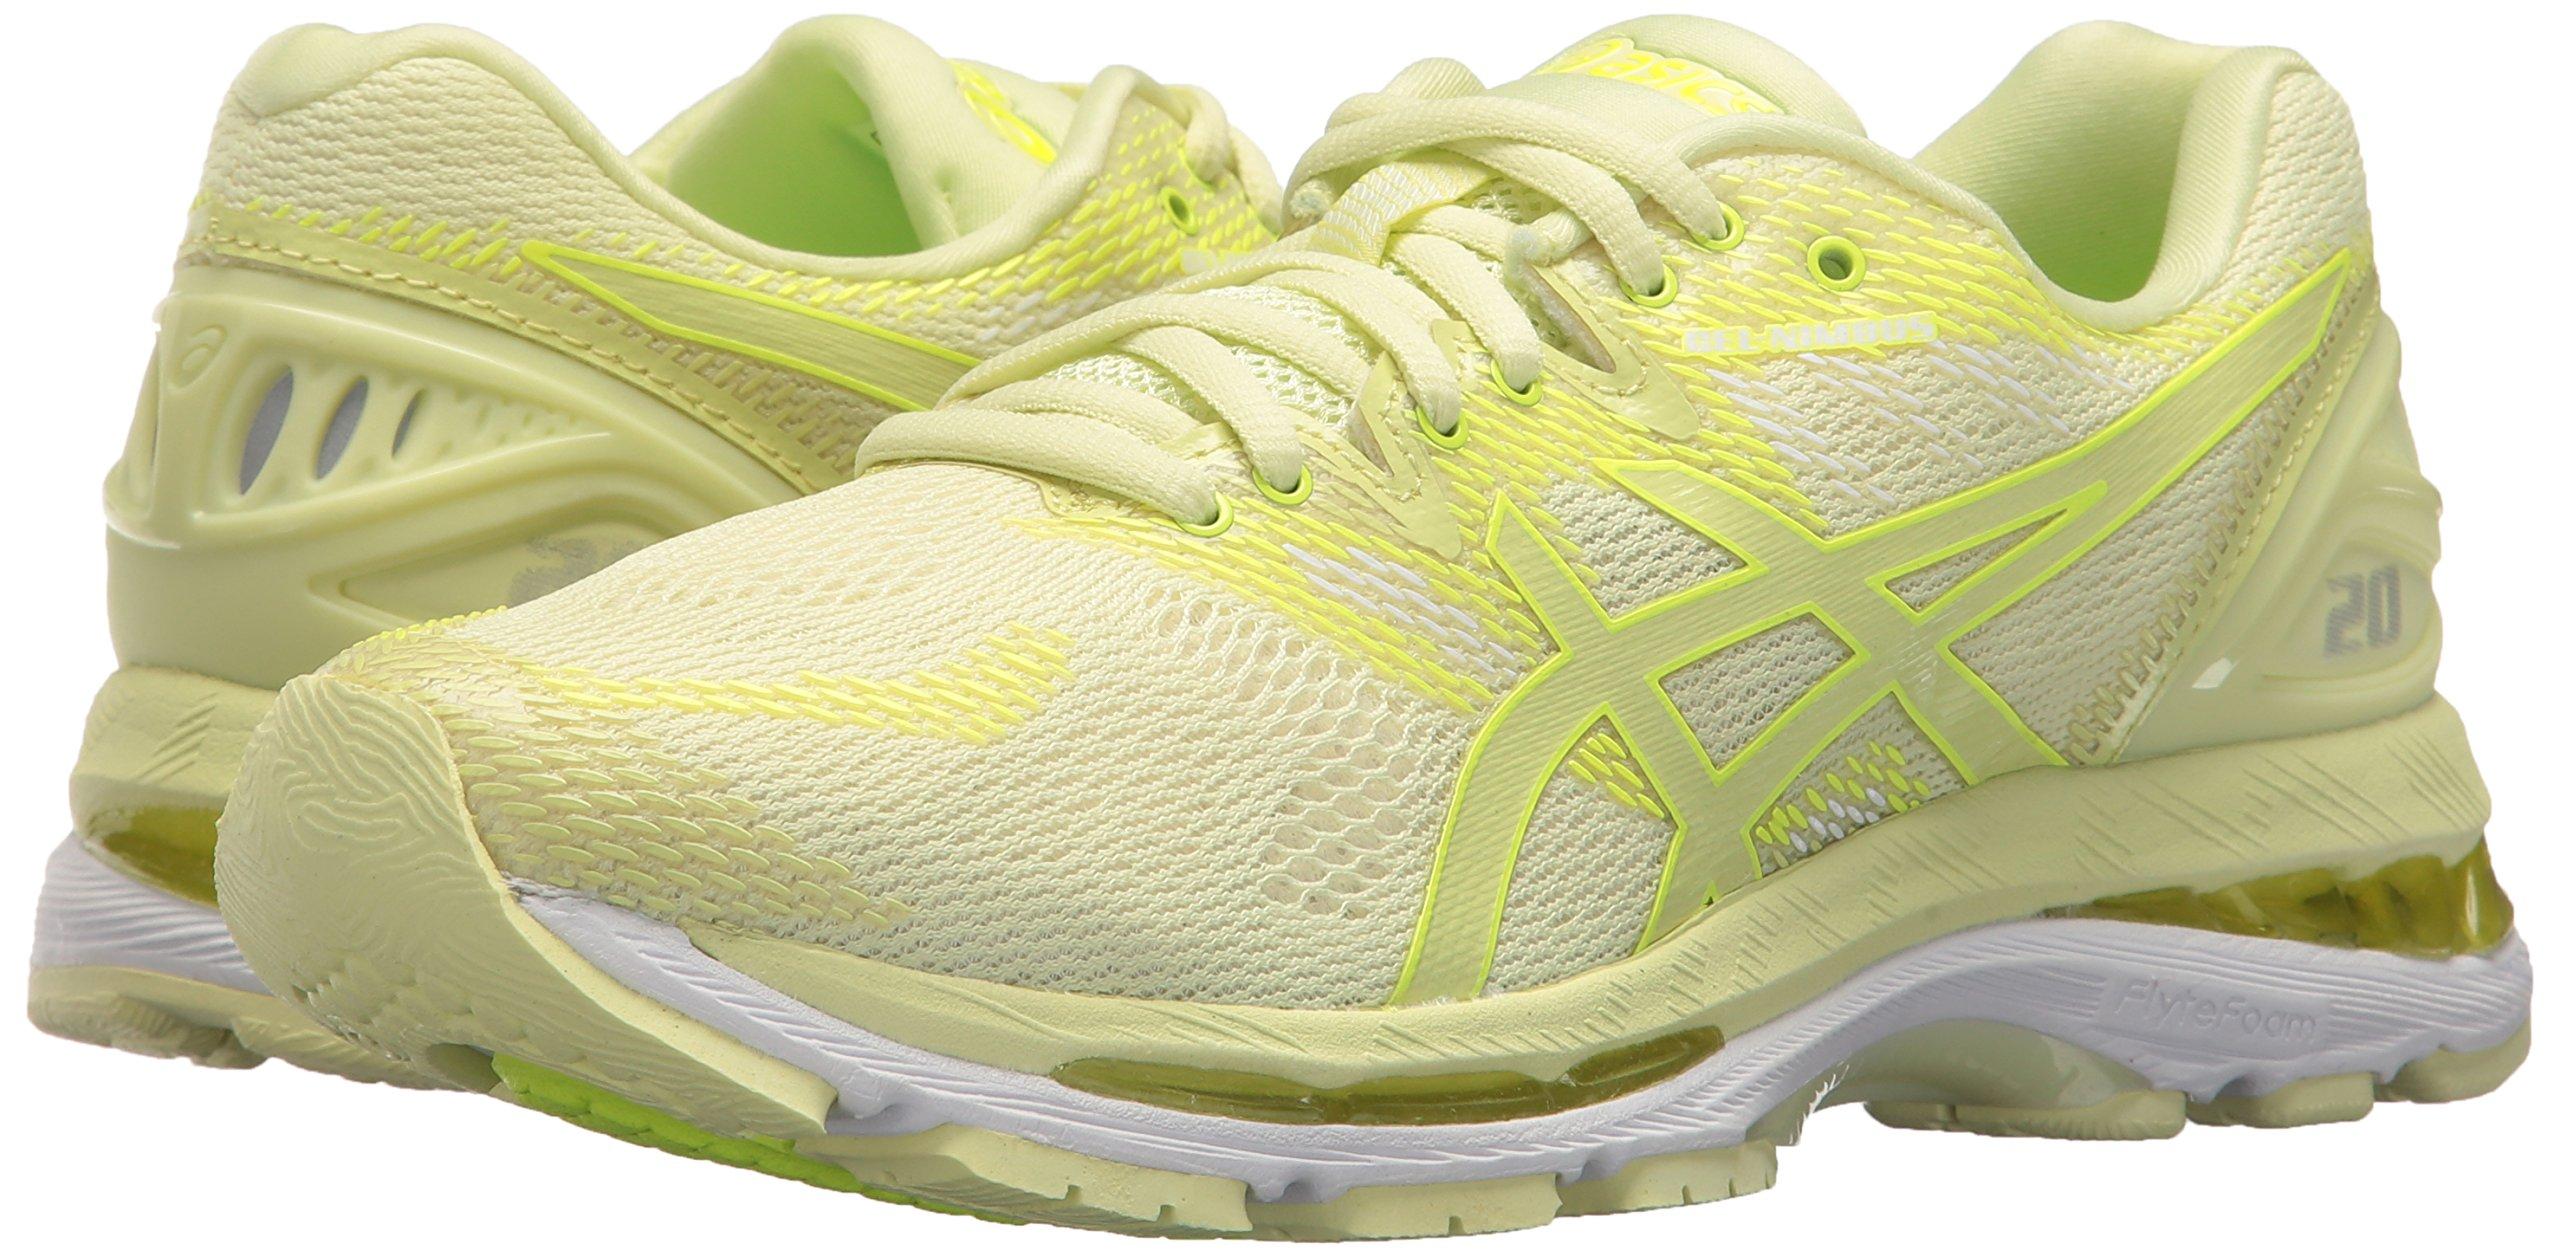 ASICS Women's Gel-Nimbus 20 Running Shoe, limelight/limelight/safety yellow, 5.5 Medium US by ASICS (Image #5)